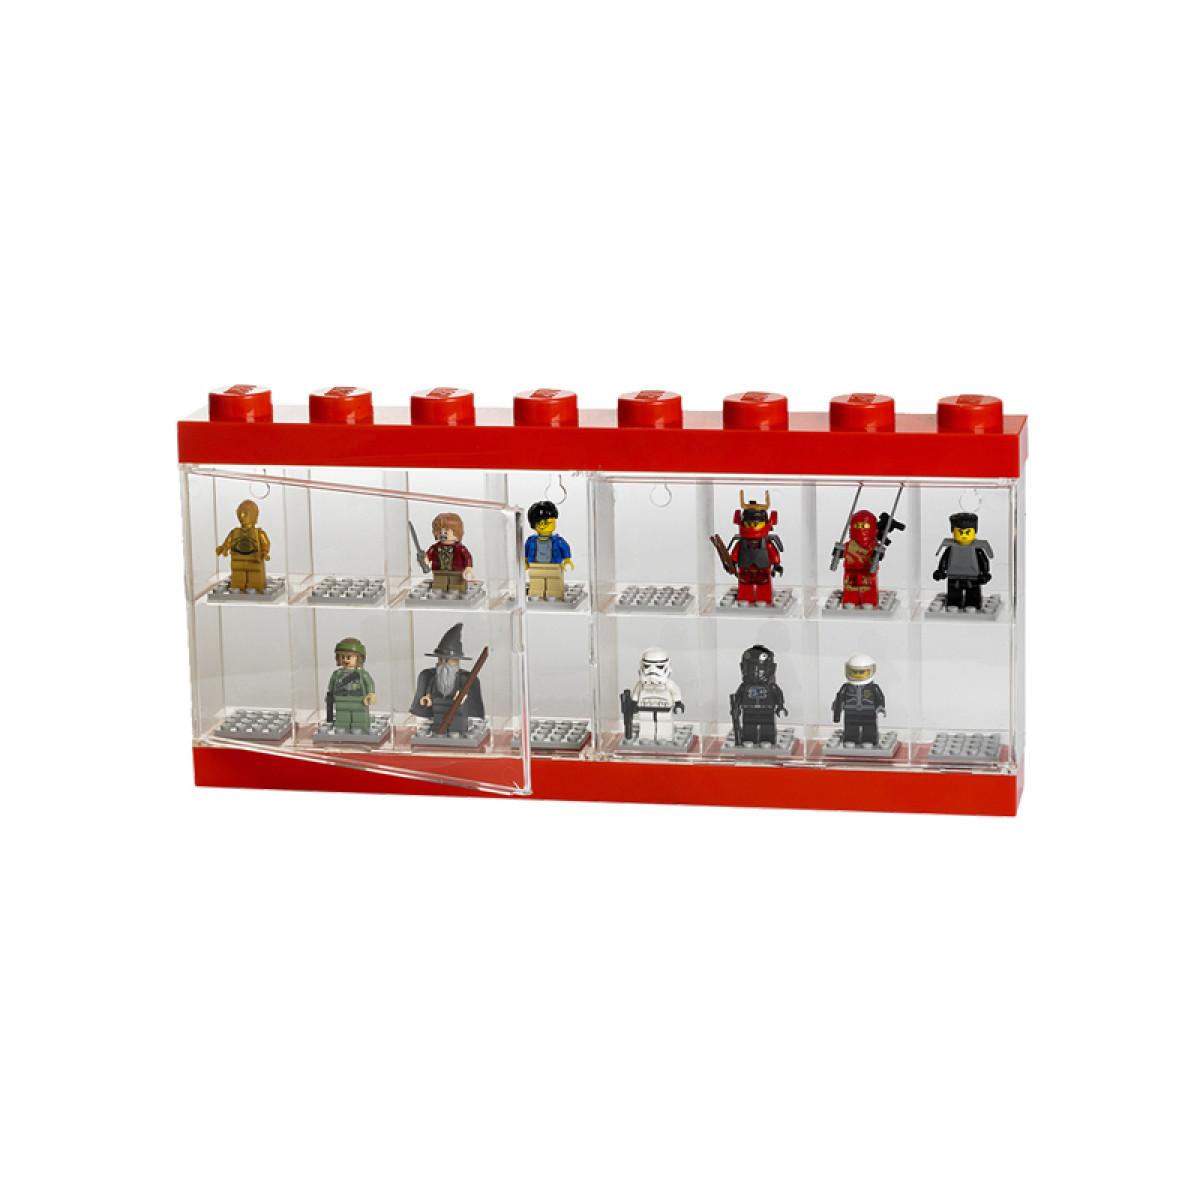 Lego Large Minifigure Display Case Red Storage